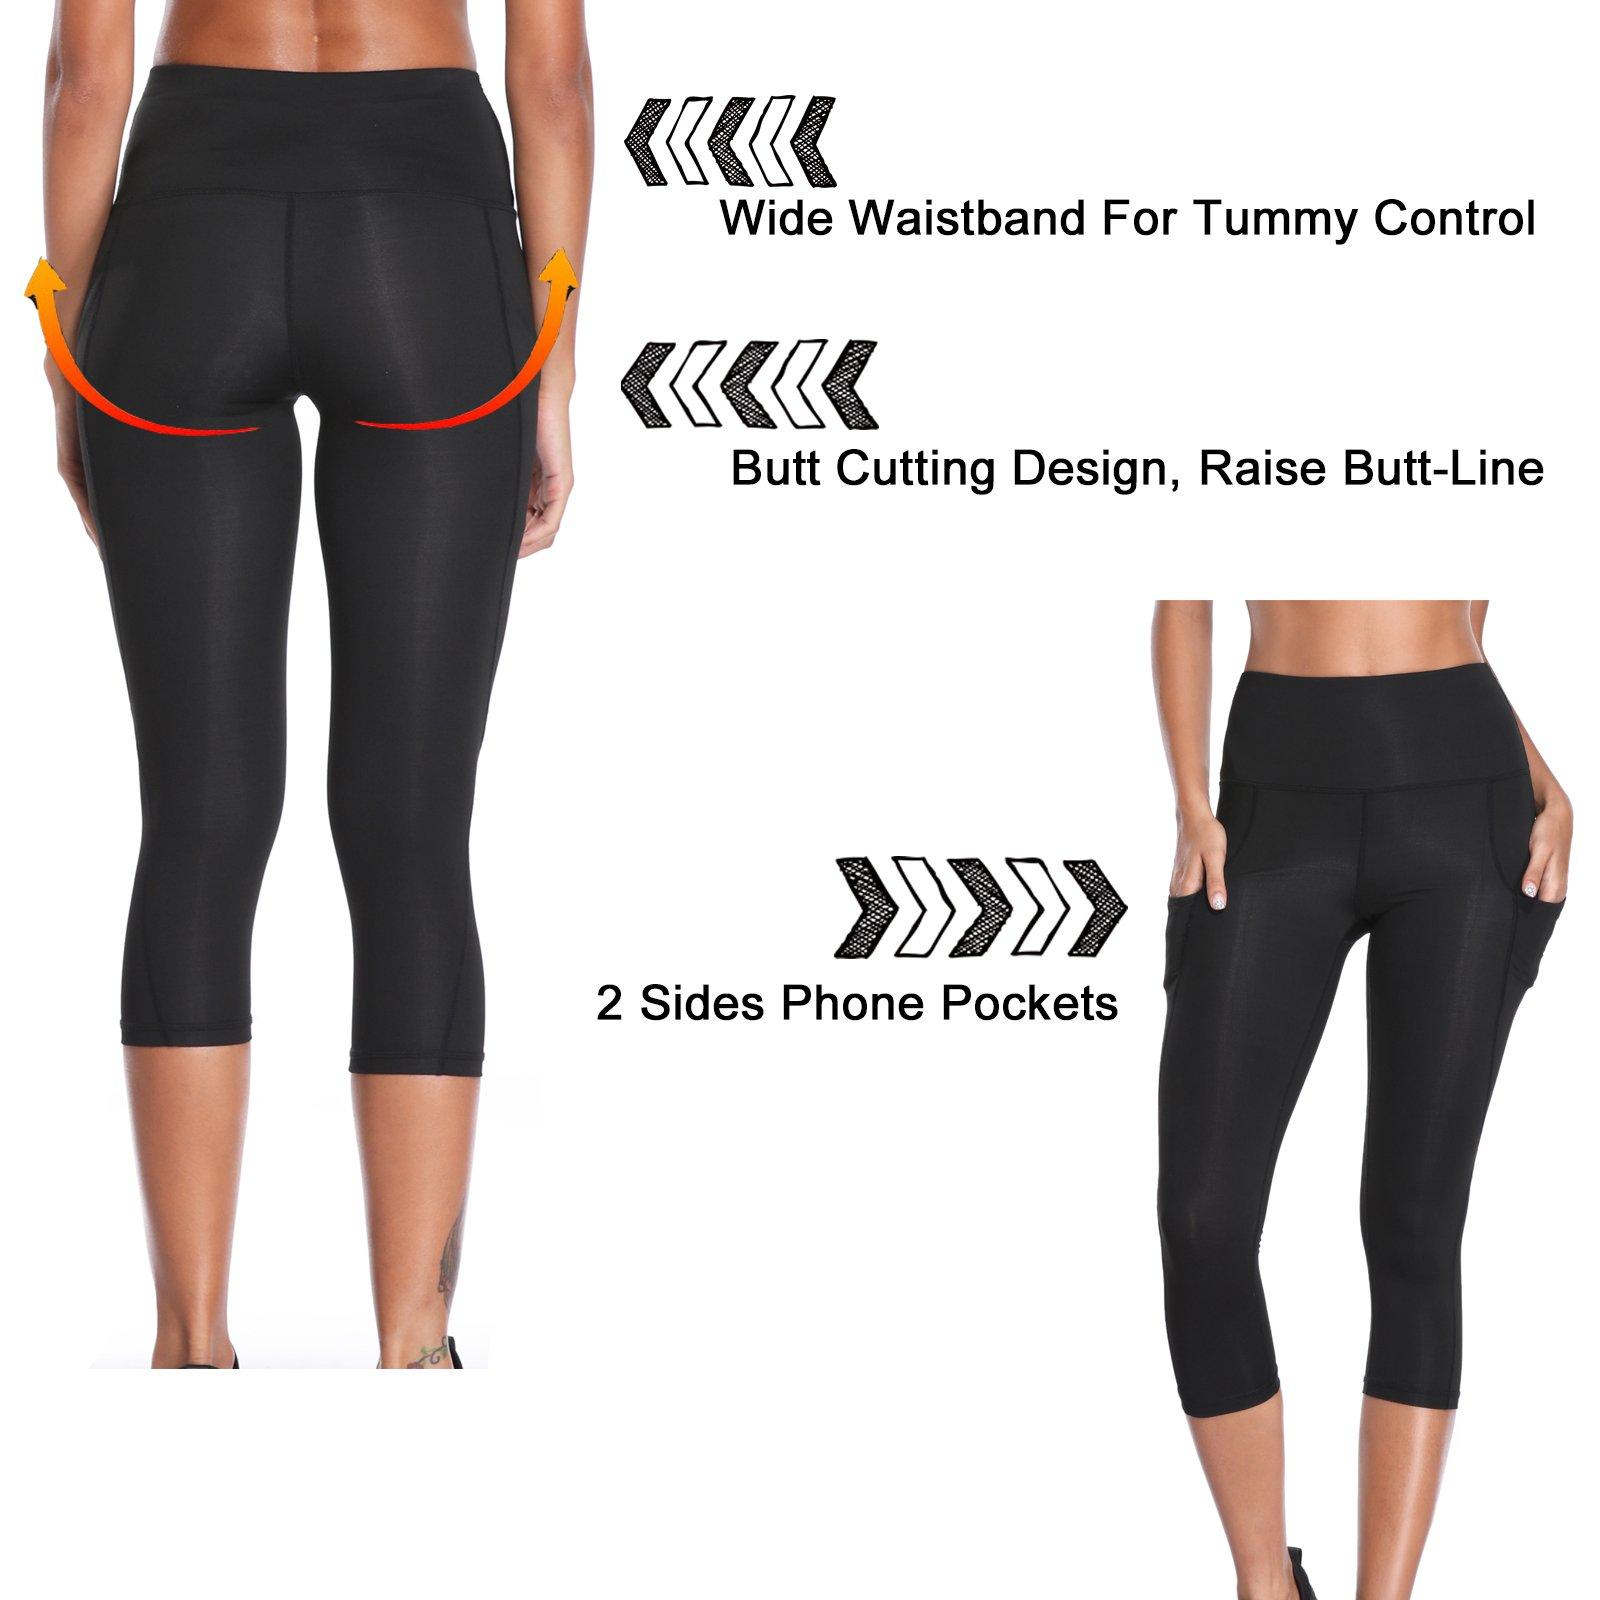 b1cd4501f0a0d Joyshaper Gym Leggings with Pockets Women 3/4 Length Cropped Capri Trousers Yoga  Pants Tights Mesh Stretchy Skinny Slim Workout Fitness Training Athletic ...